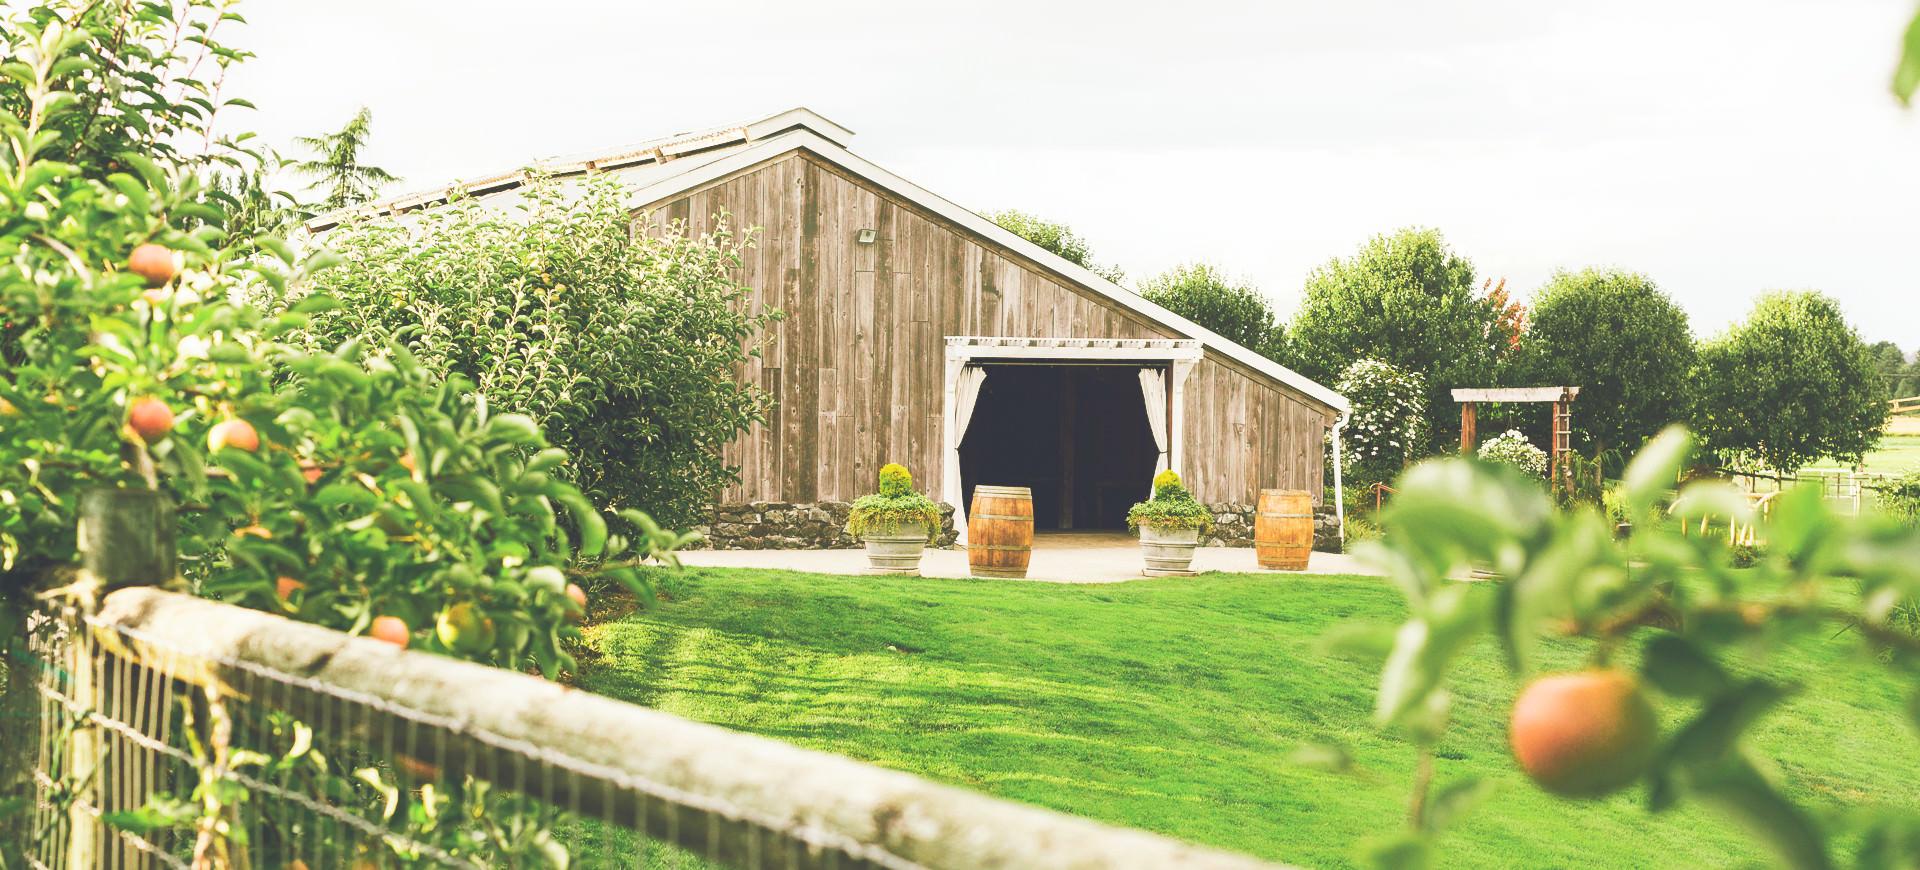 Swans Trail Farm - Snohomish